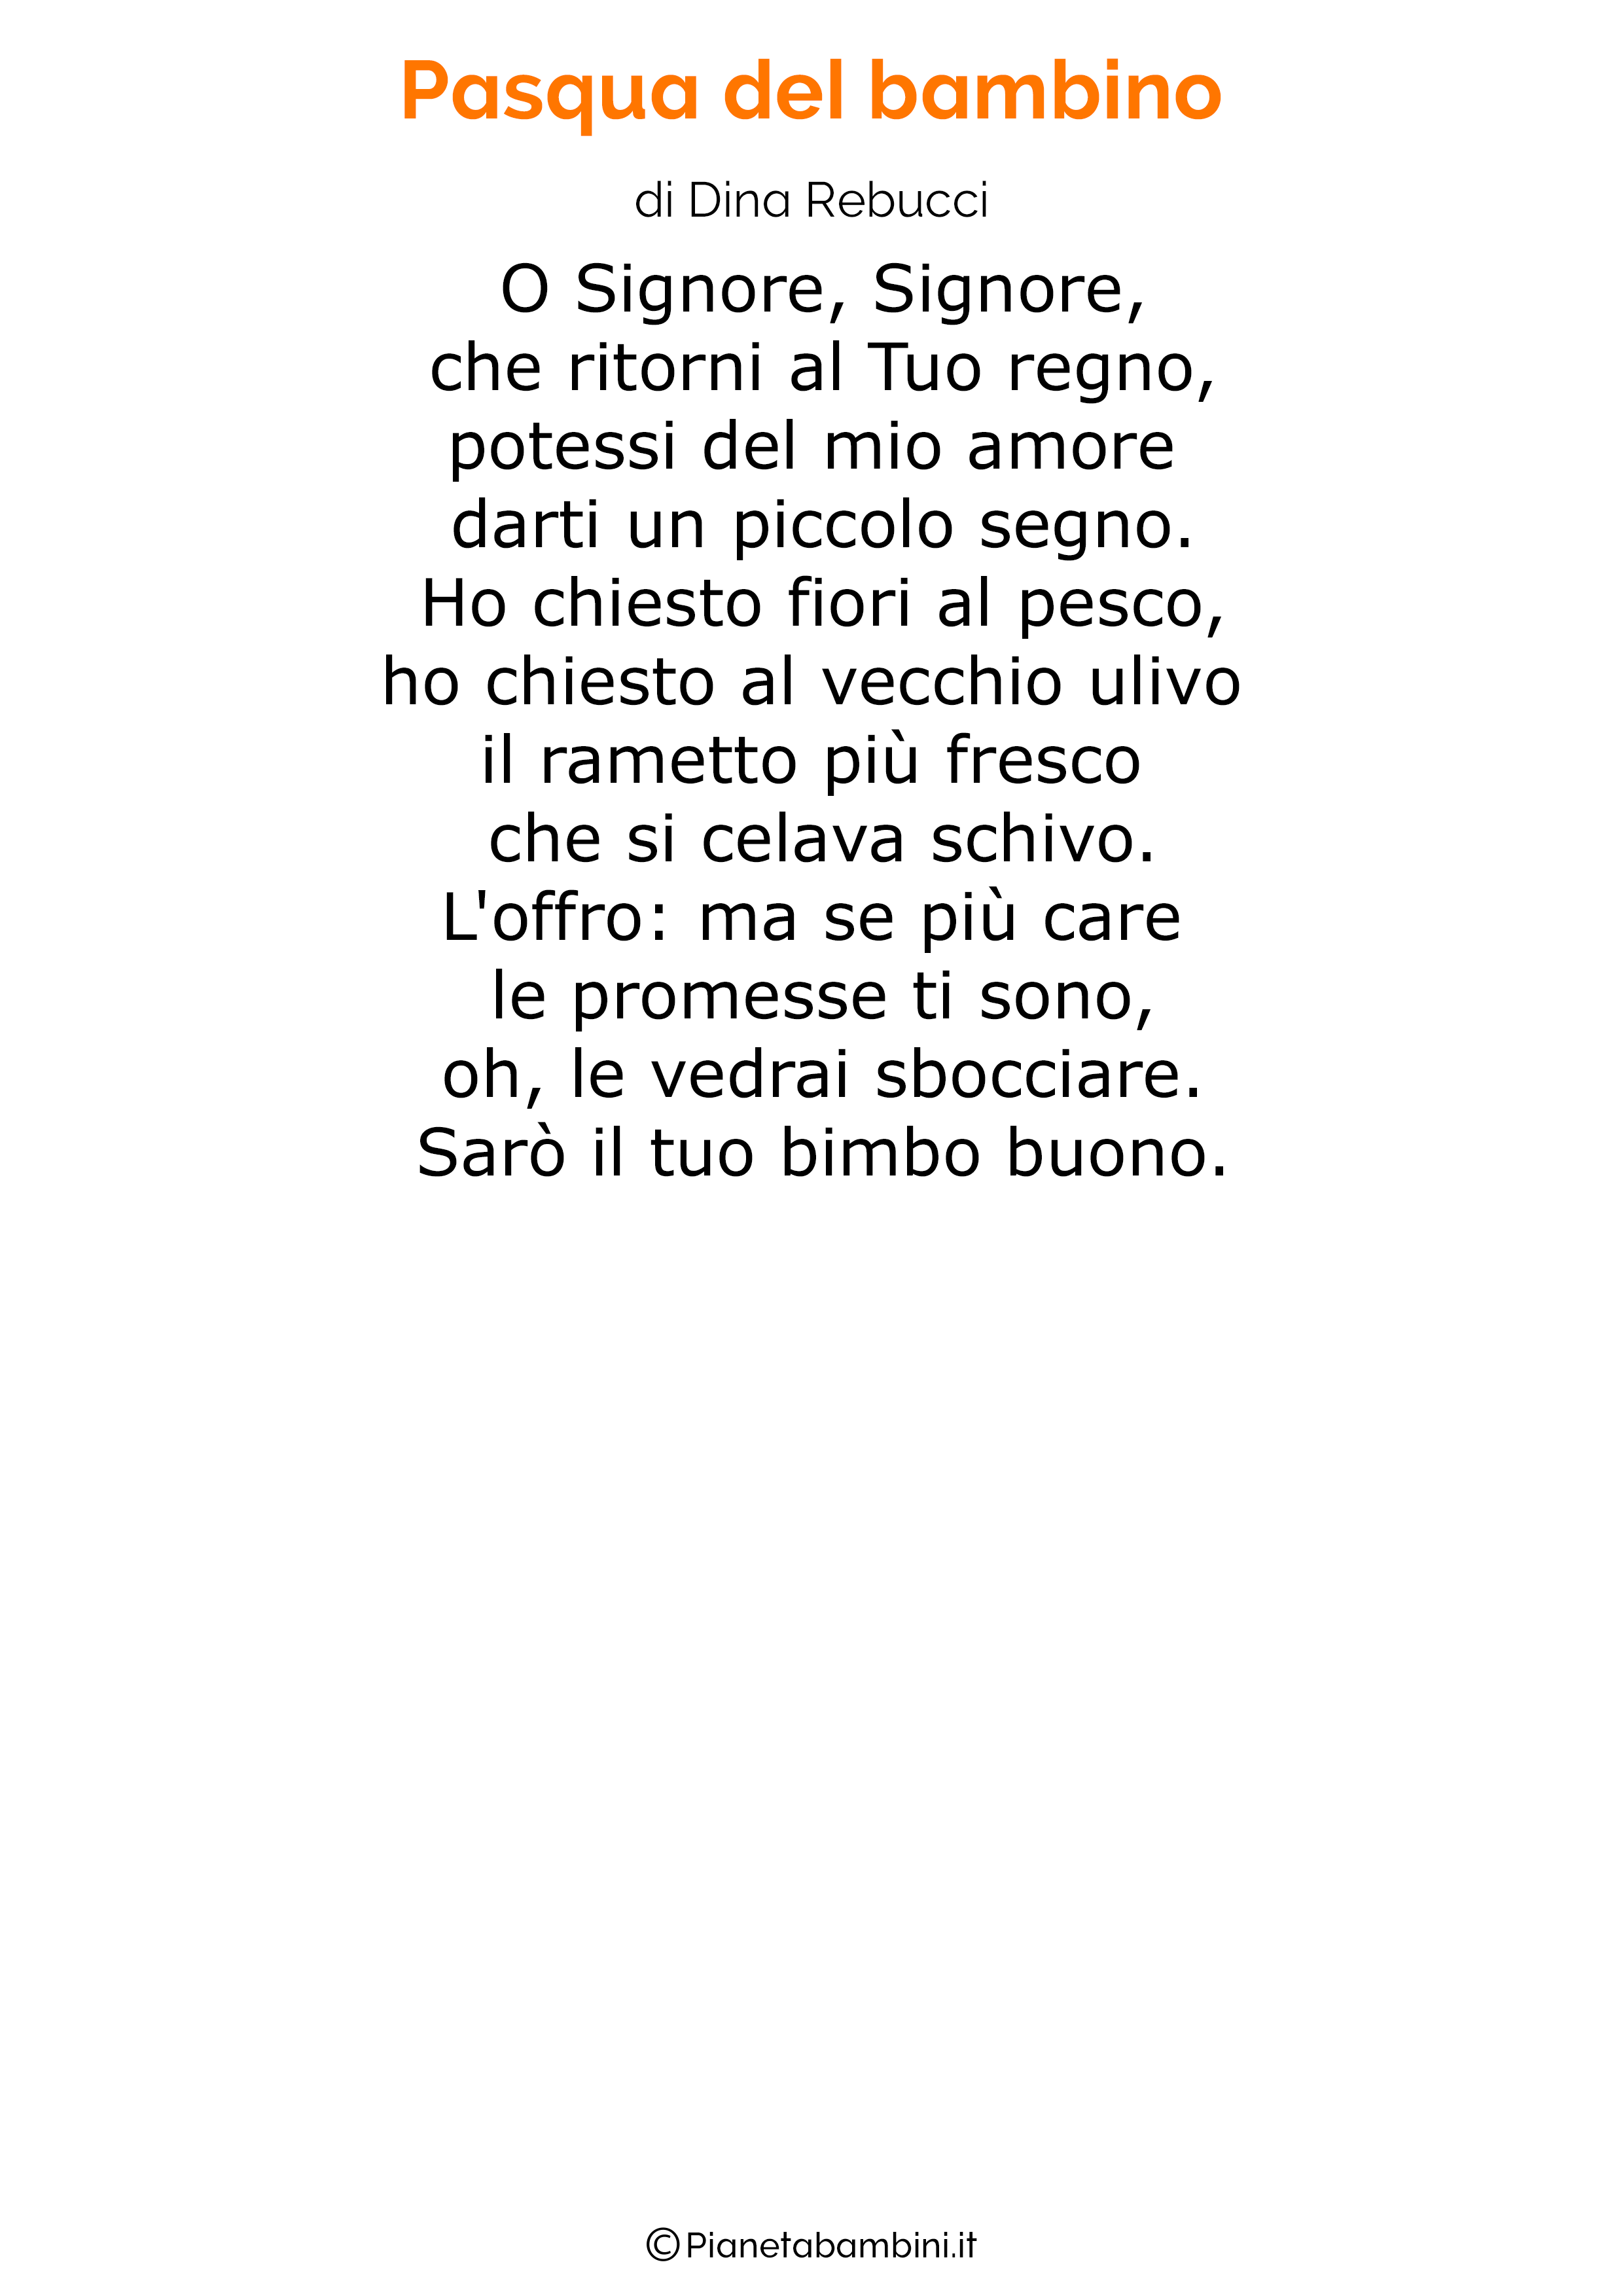 Poesia di Pasqua 21